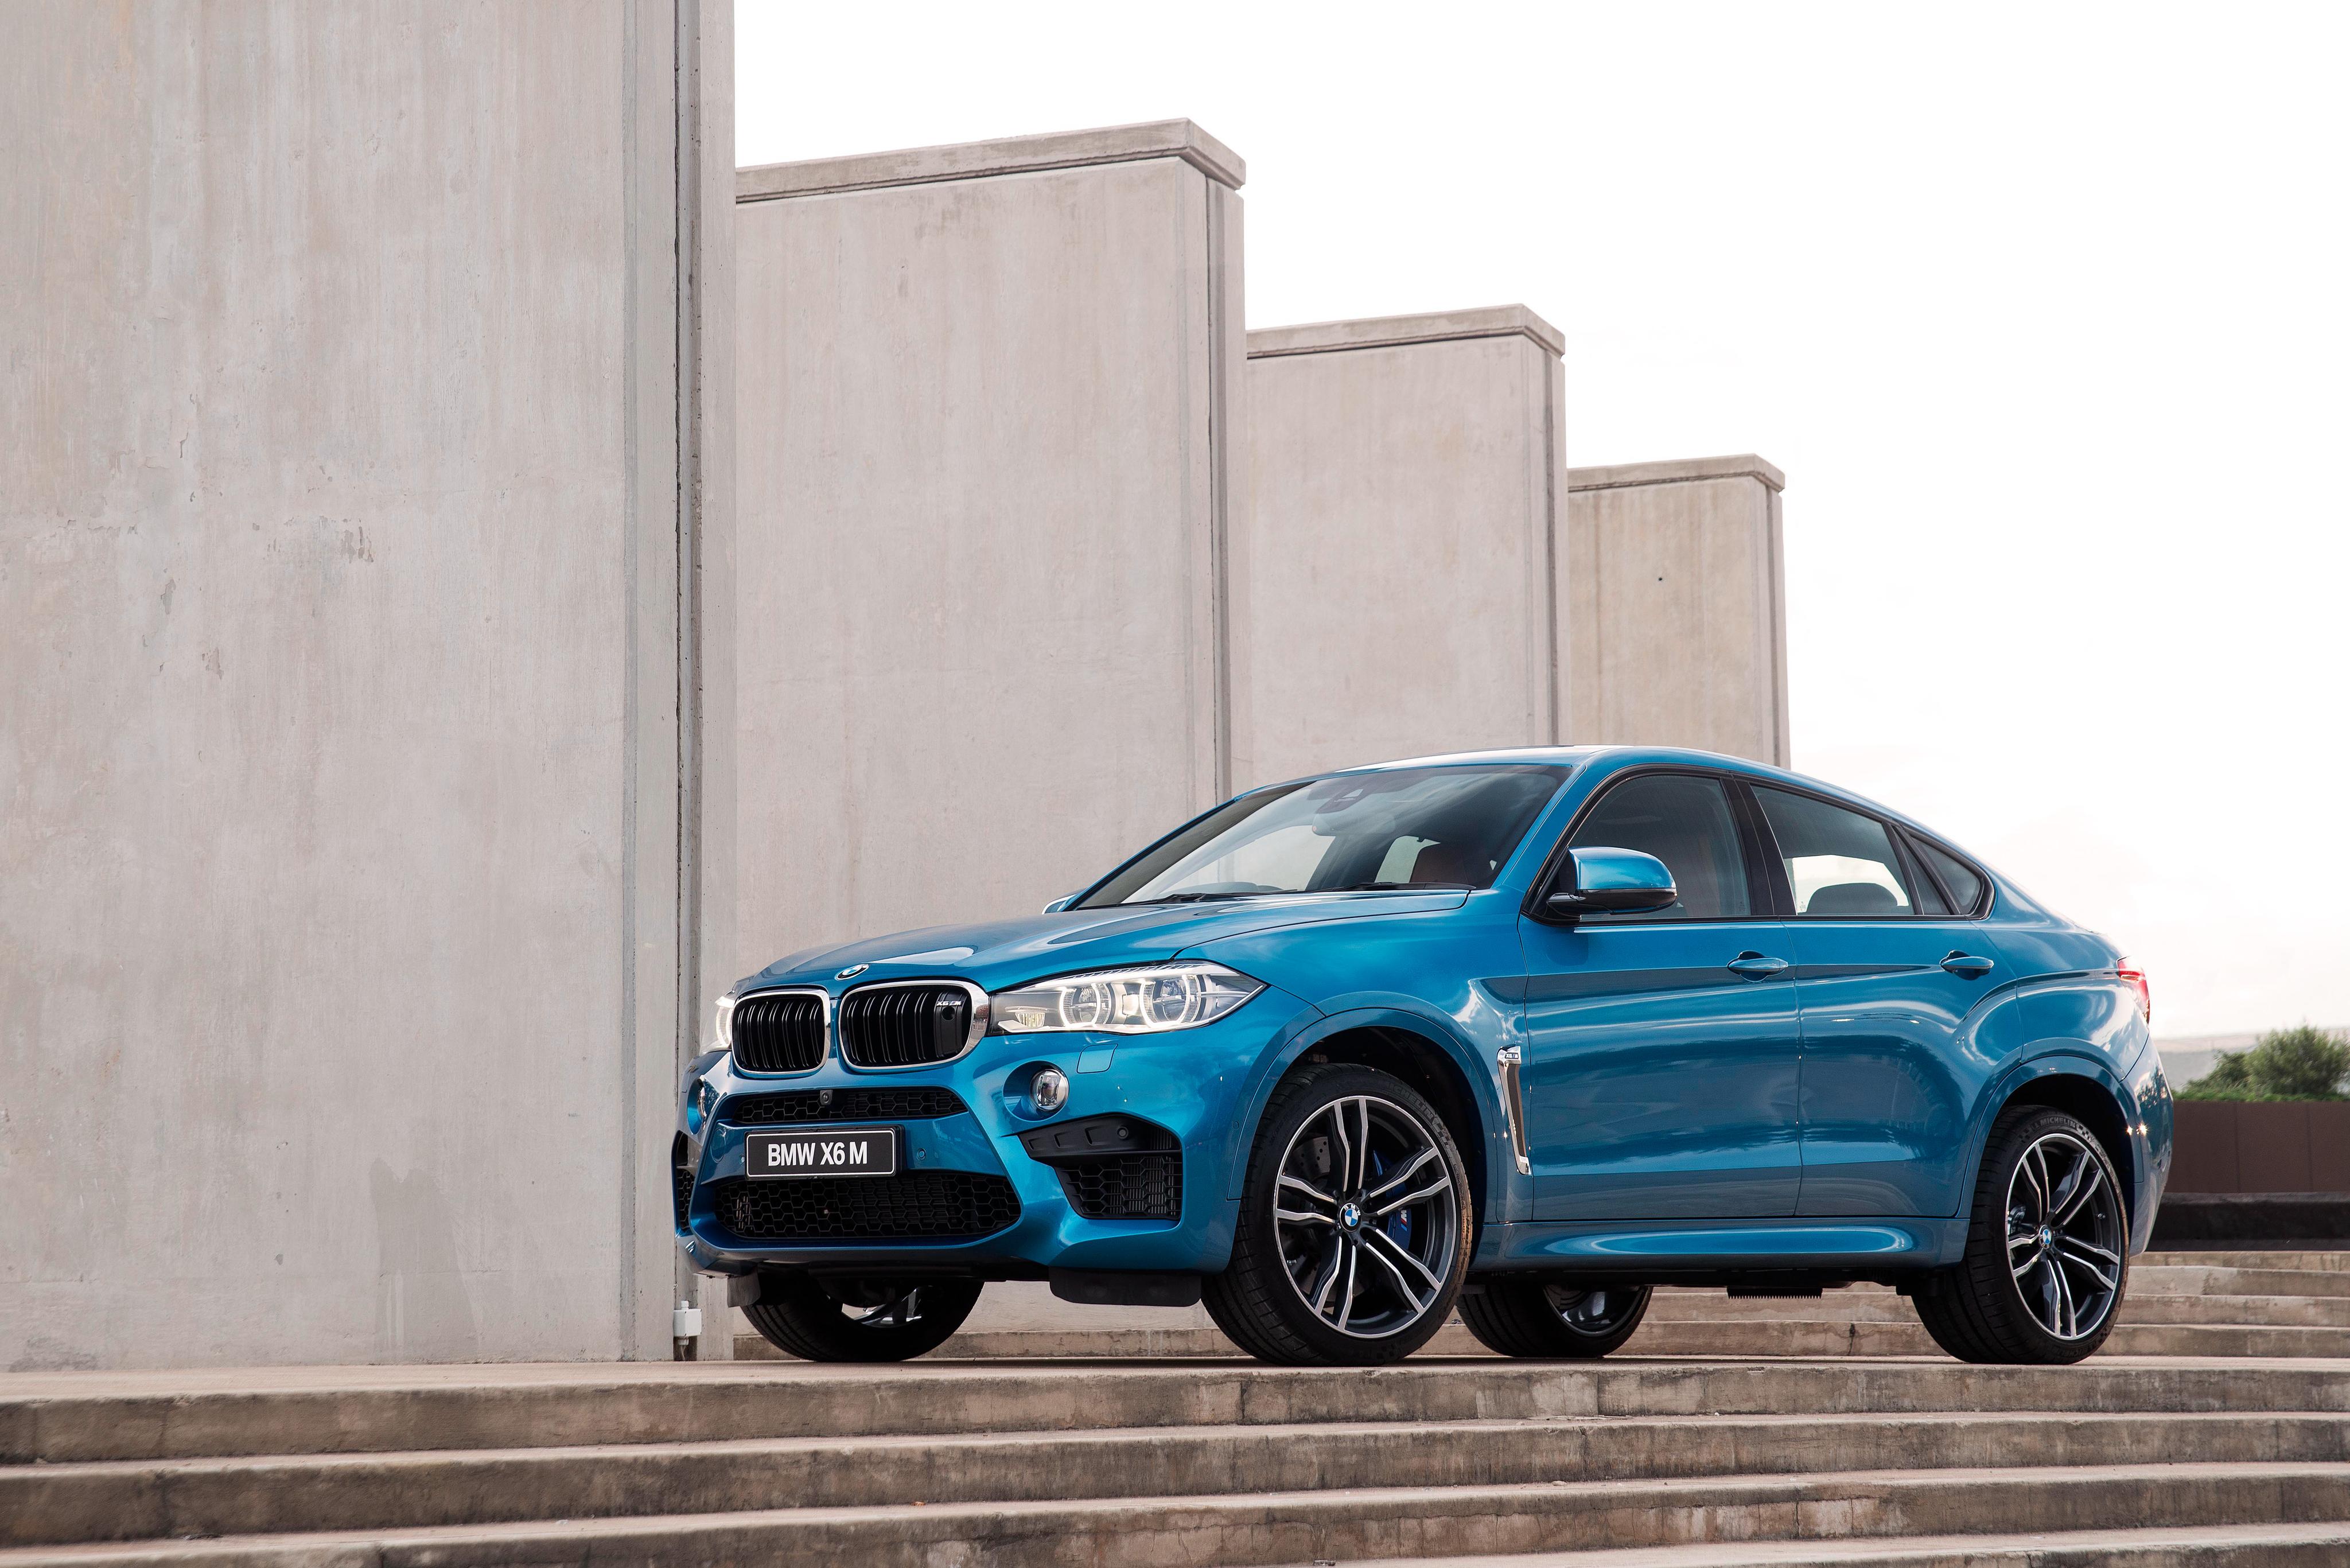 BMW X6 4k Ultra HD Wallpaper | Background Image ...